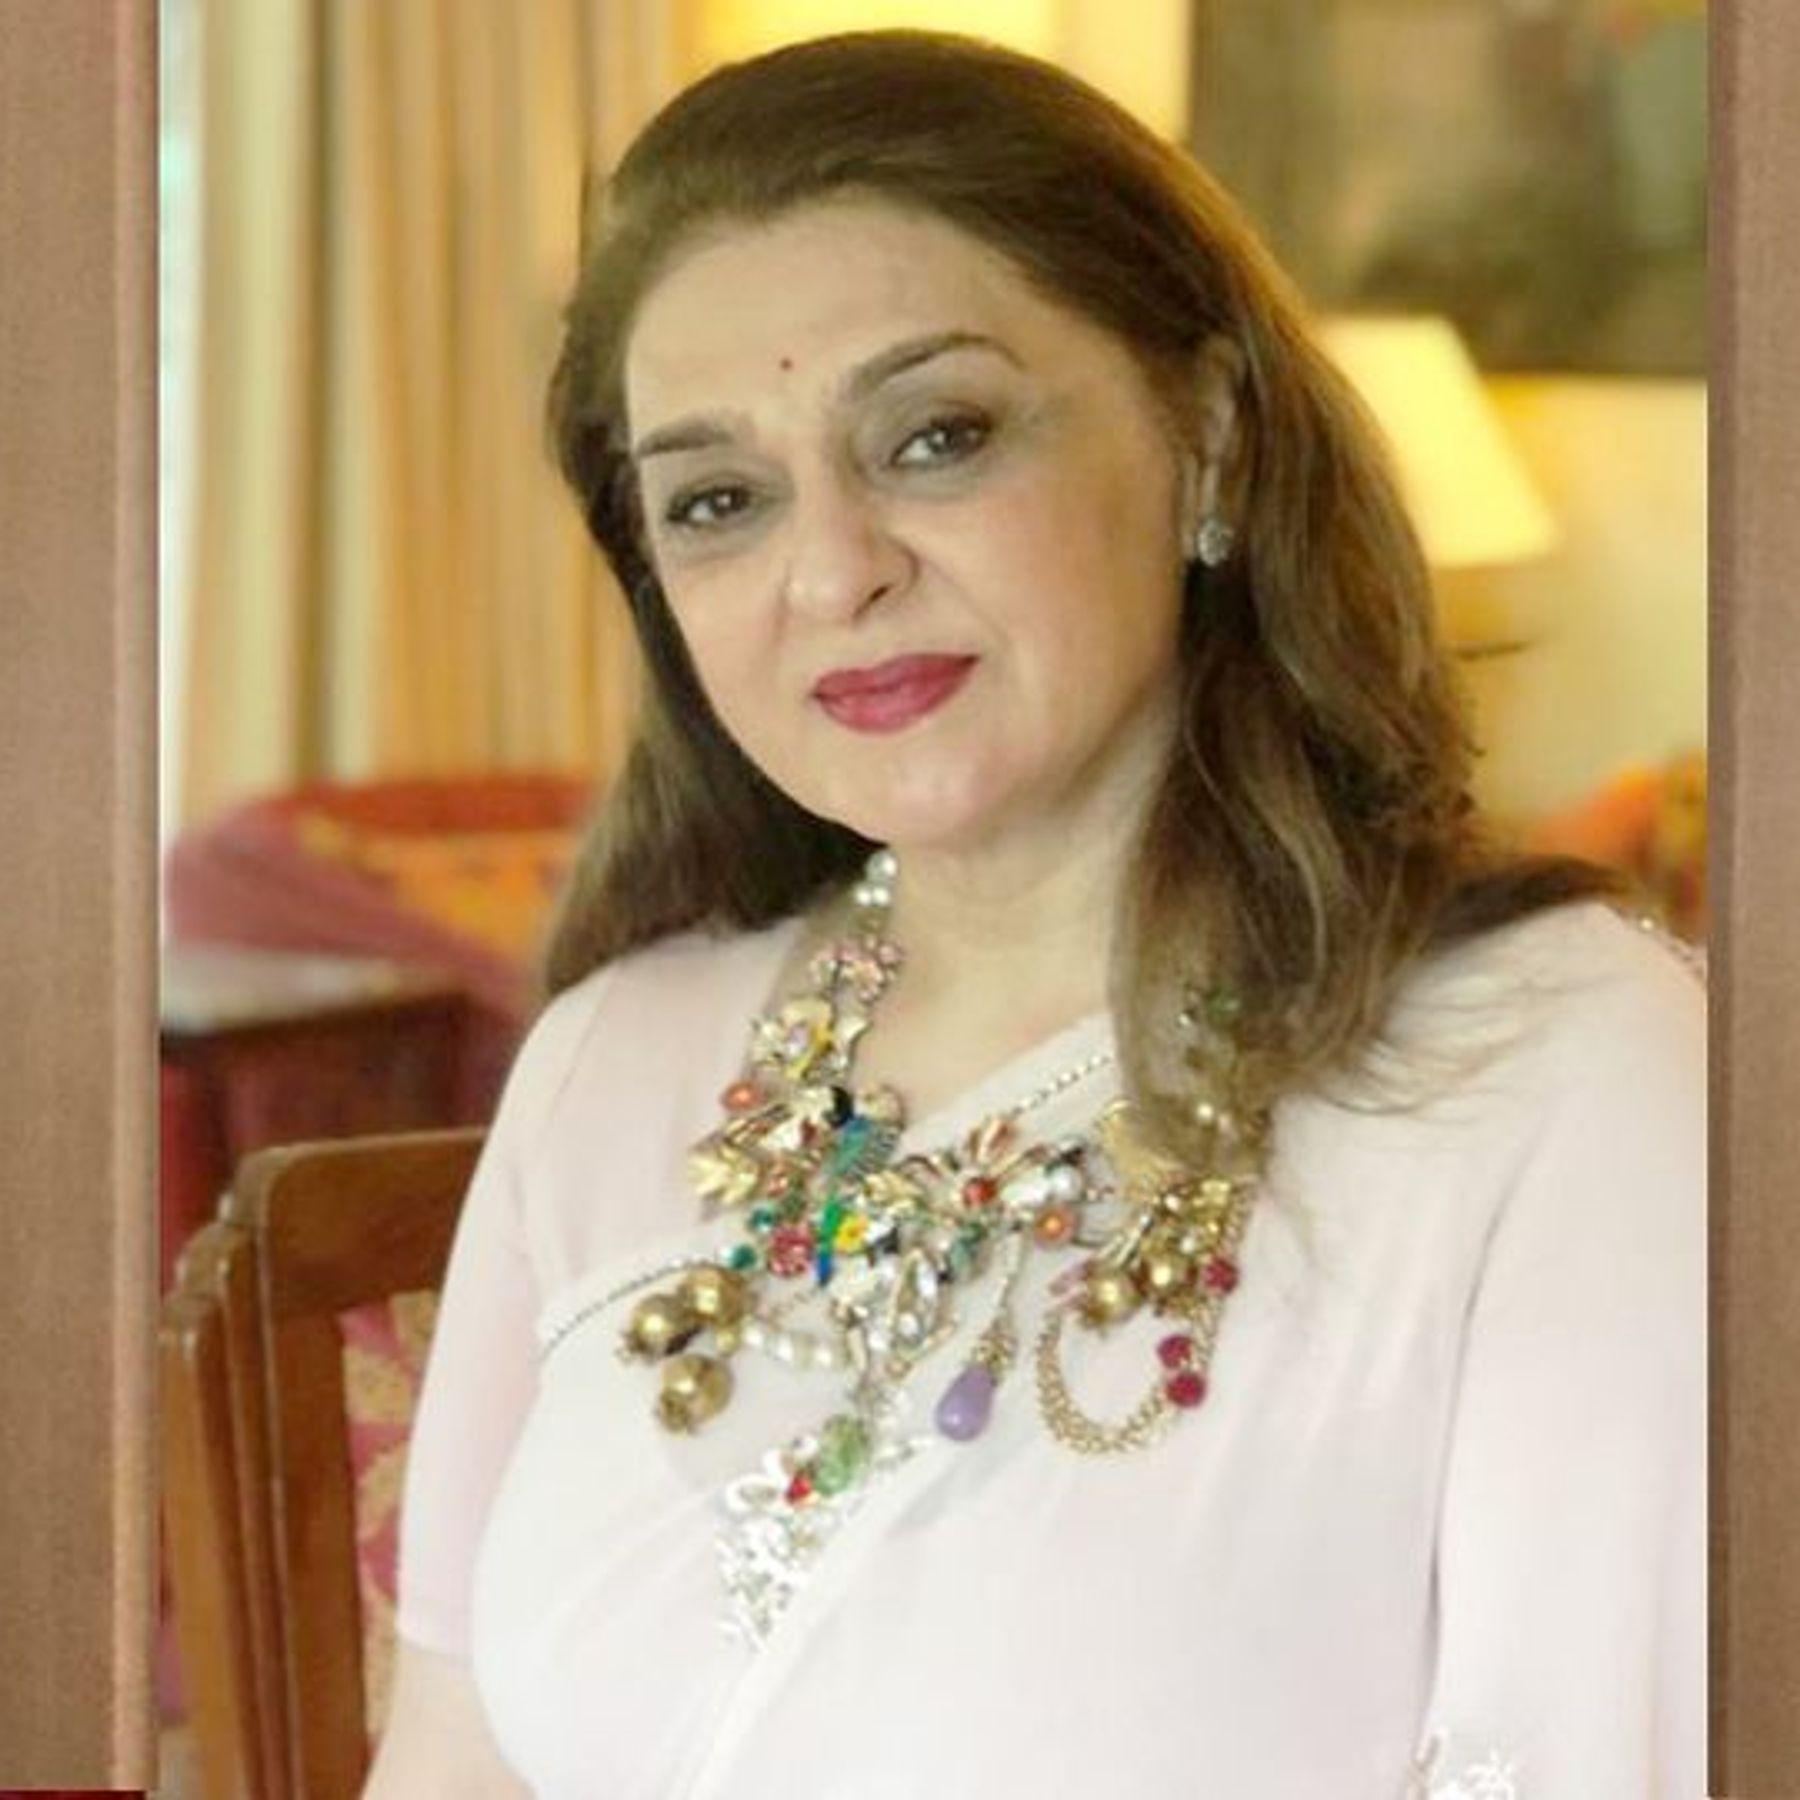 Malika Amin of Alembic Pharma, the richest woman in Gujarat, is fond of cooking and food.   ગુજરાતના સૌથી અમીર મહિલા એલેમ્બિક ફાર્માના મલિકા અમીનને રસોઈ બનાવવાનો અને ખાન-પાનના છે ...